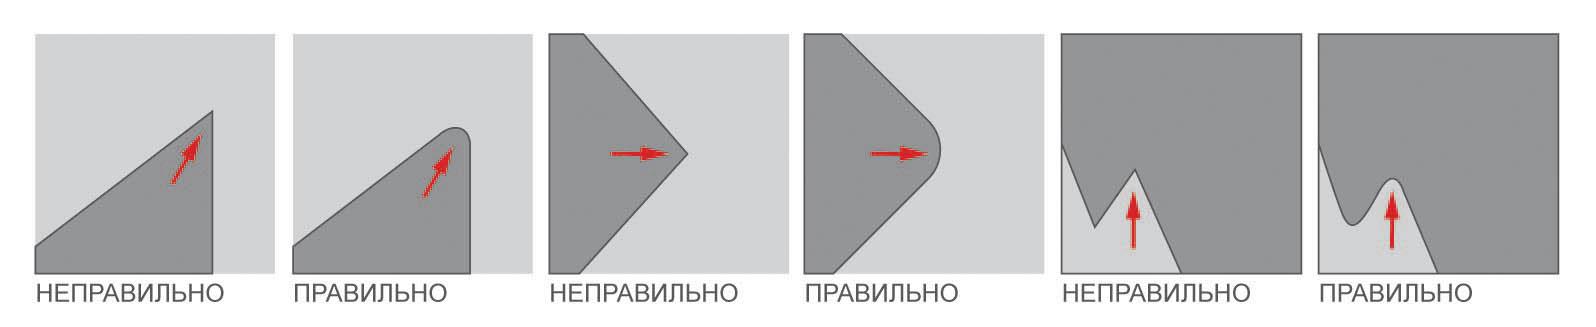 Макеты объемных наклеек